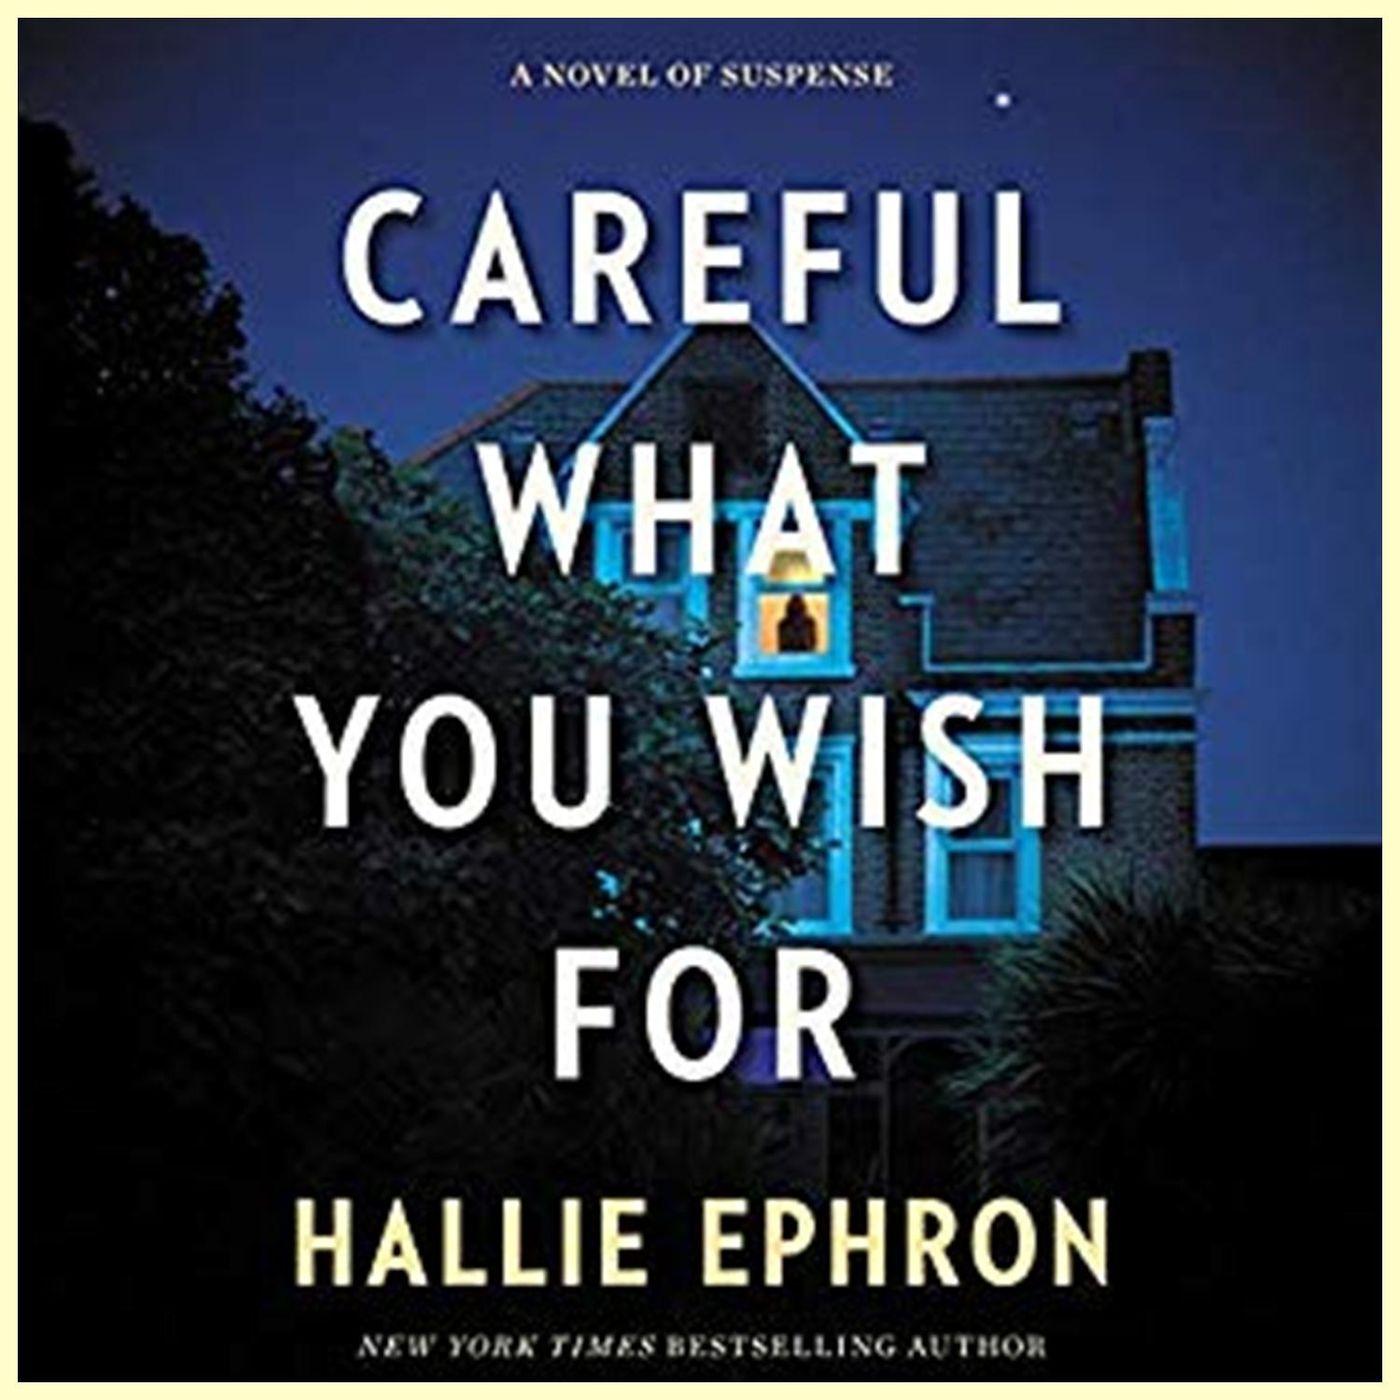 HALLIE EPHRON - Careful What You Wish For